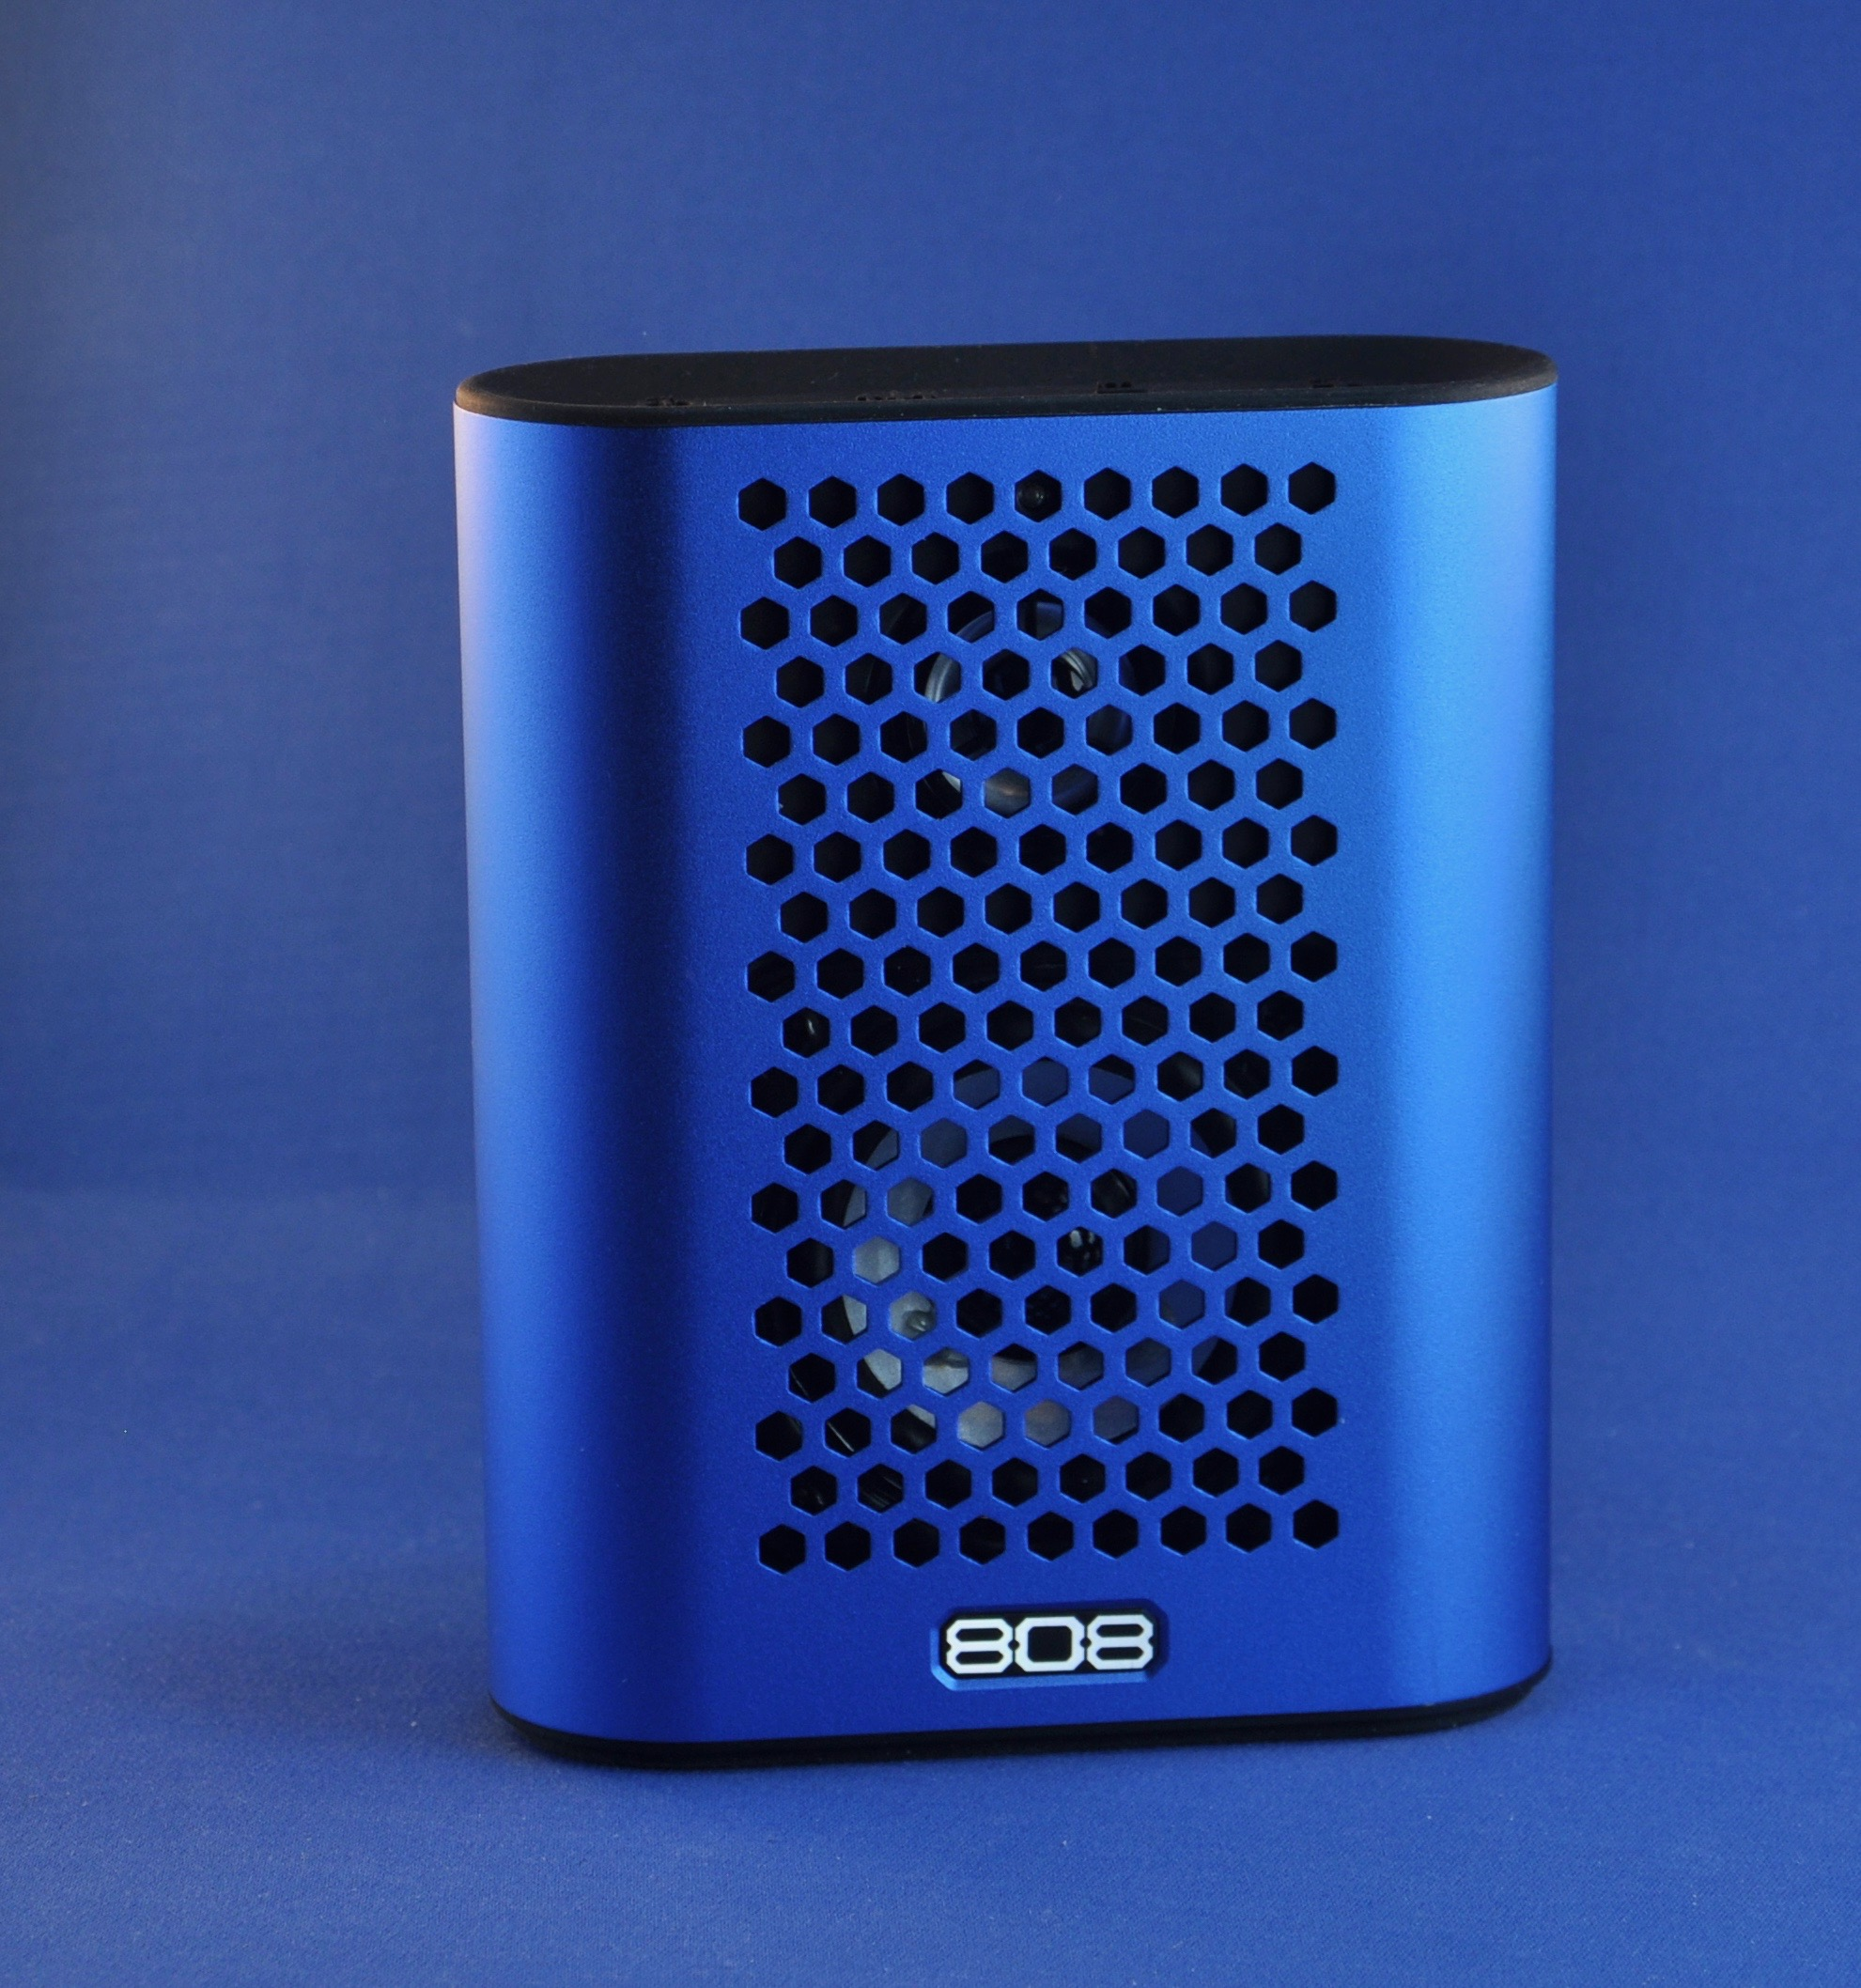 808 HEX TLS Bluetooth speaker review – The Gadgeteer